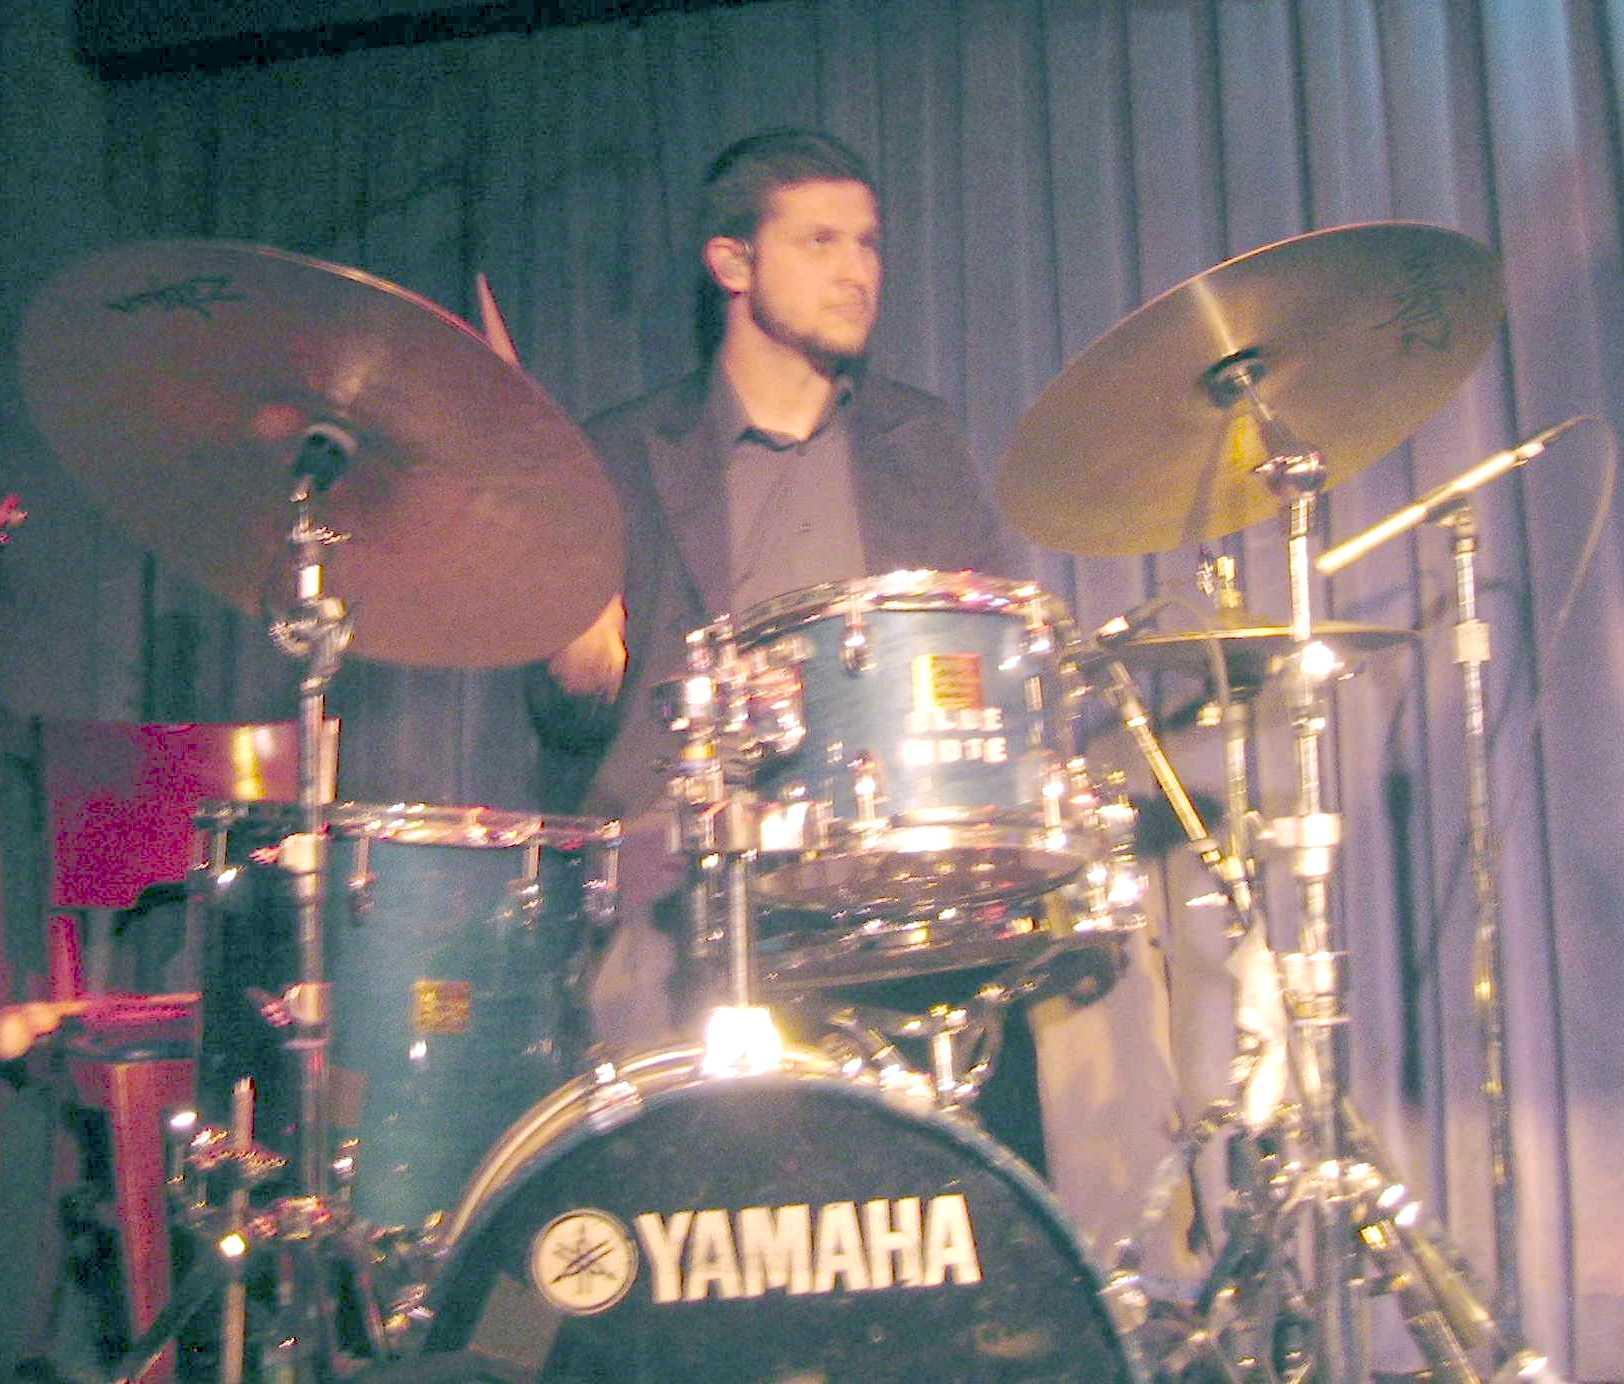 Chad Melton